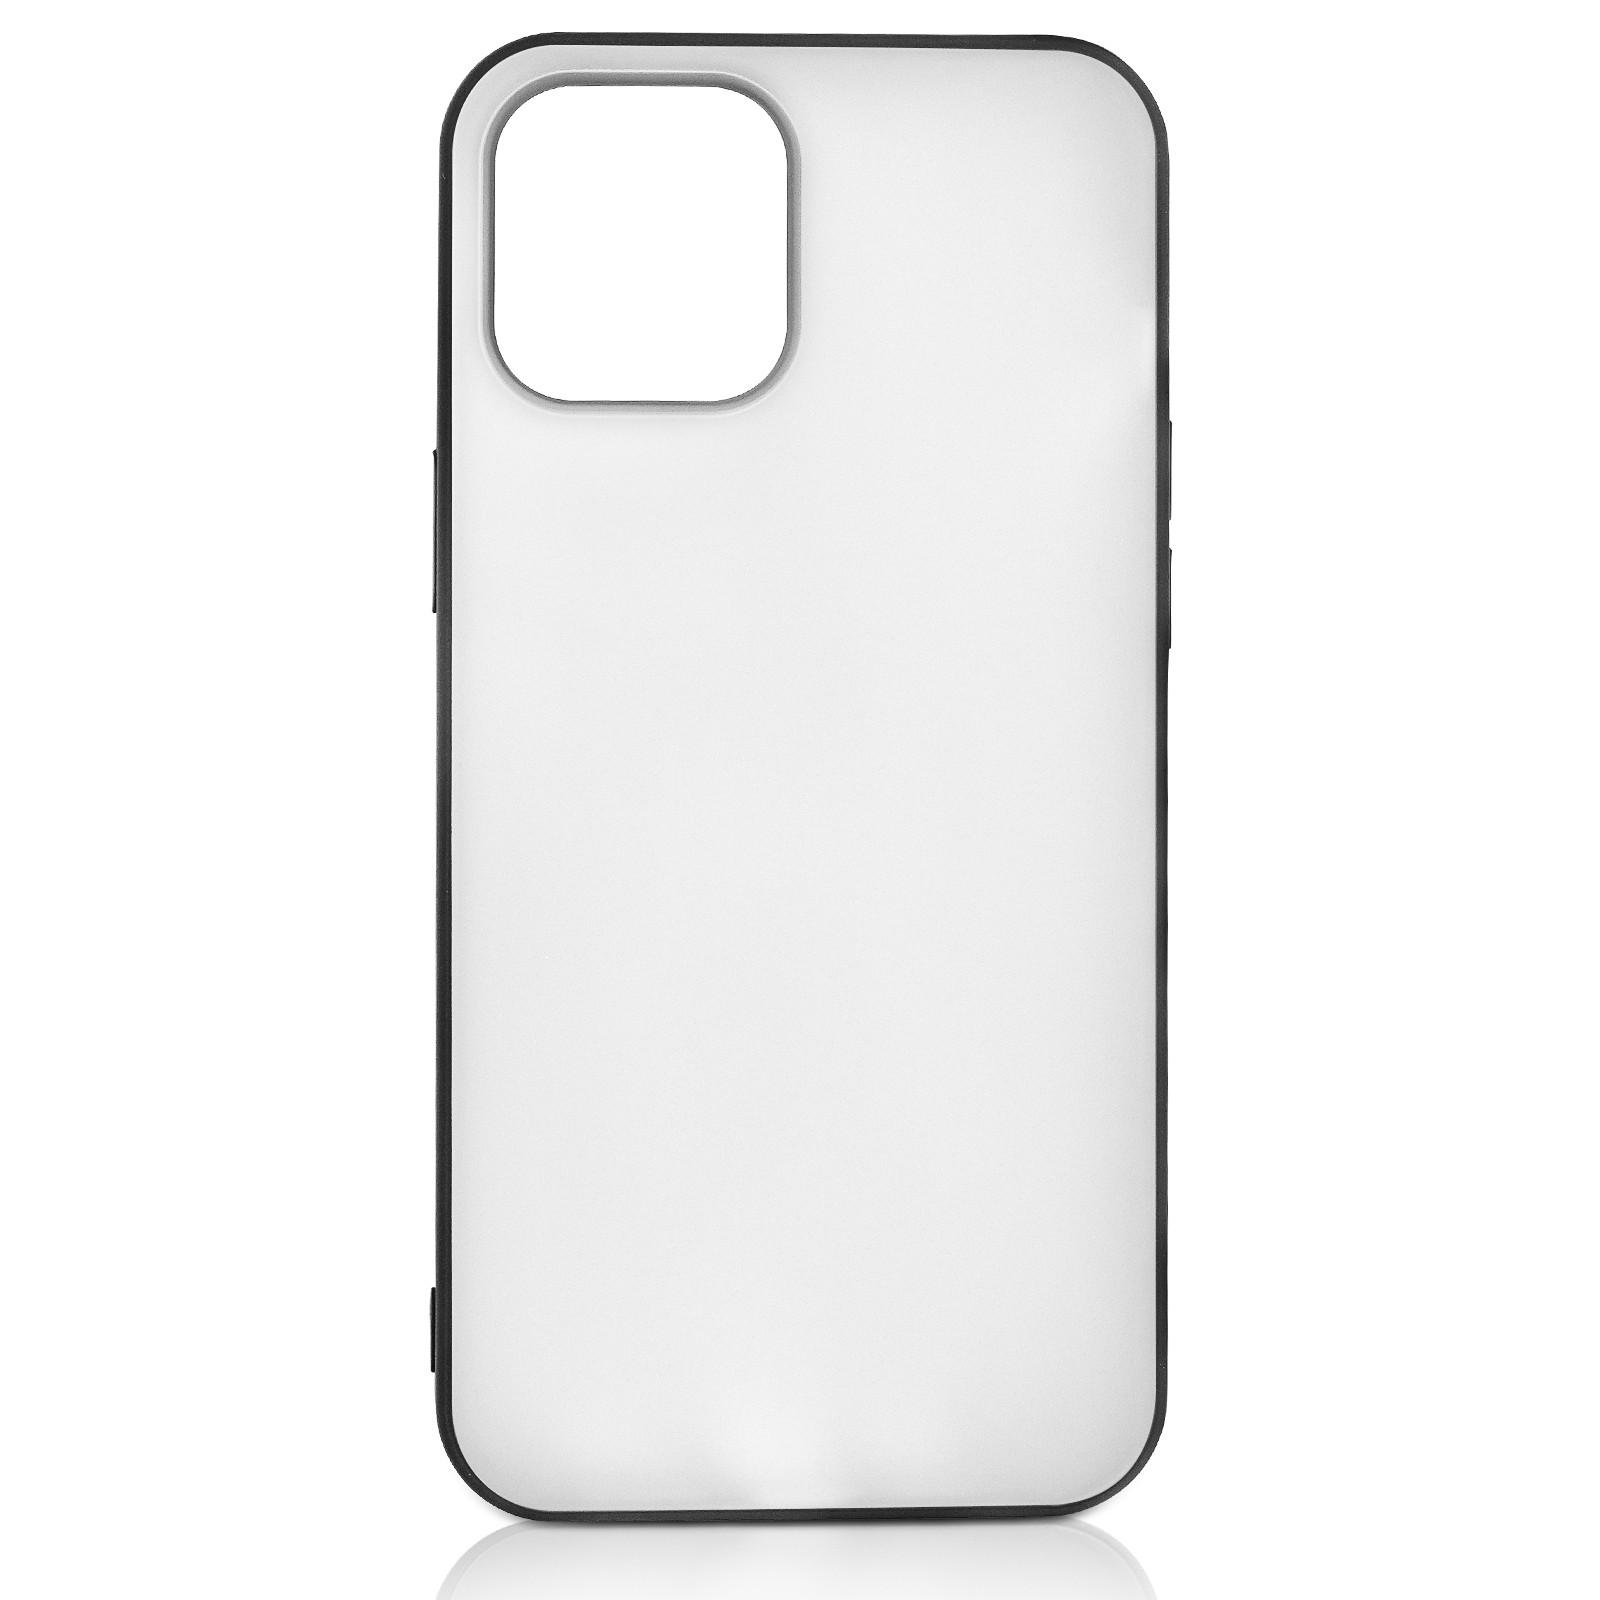 Capac protectie spate cellara colectia shade pentru iphone 12 mini - negru